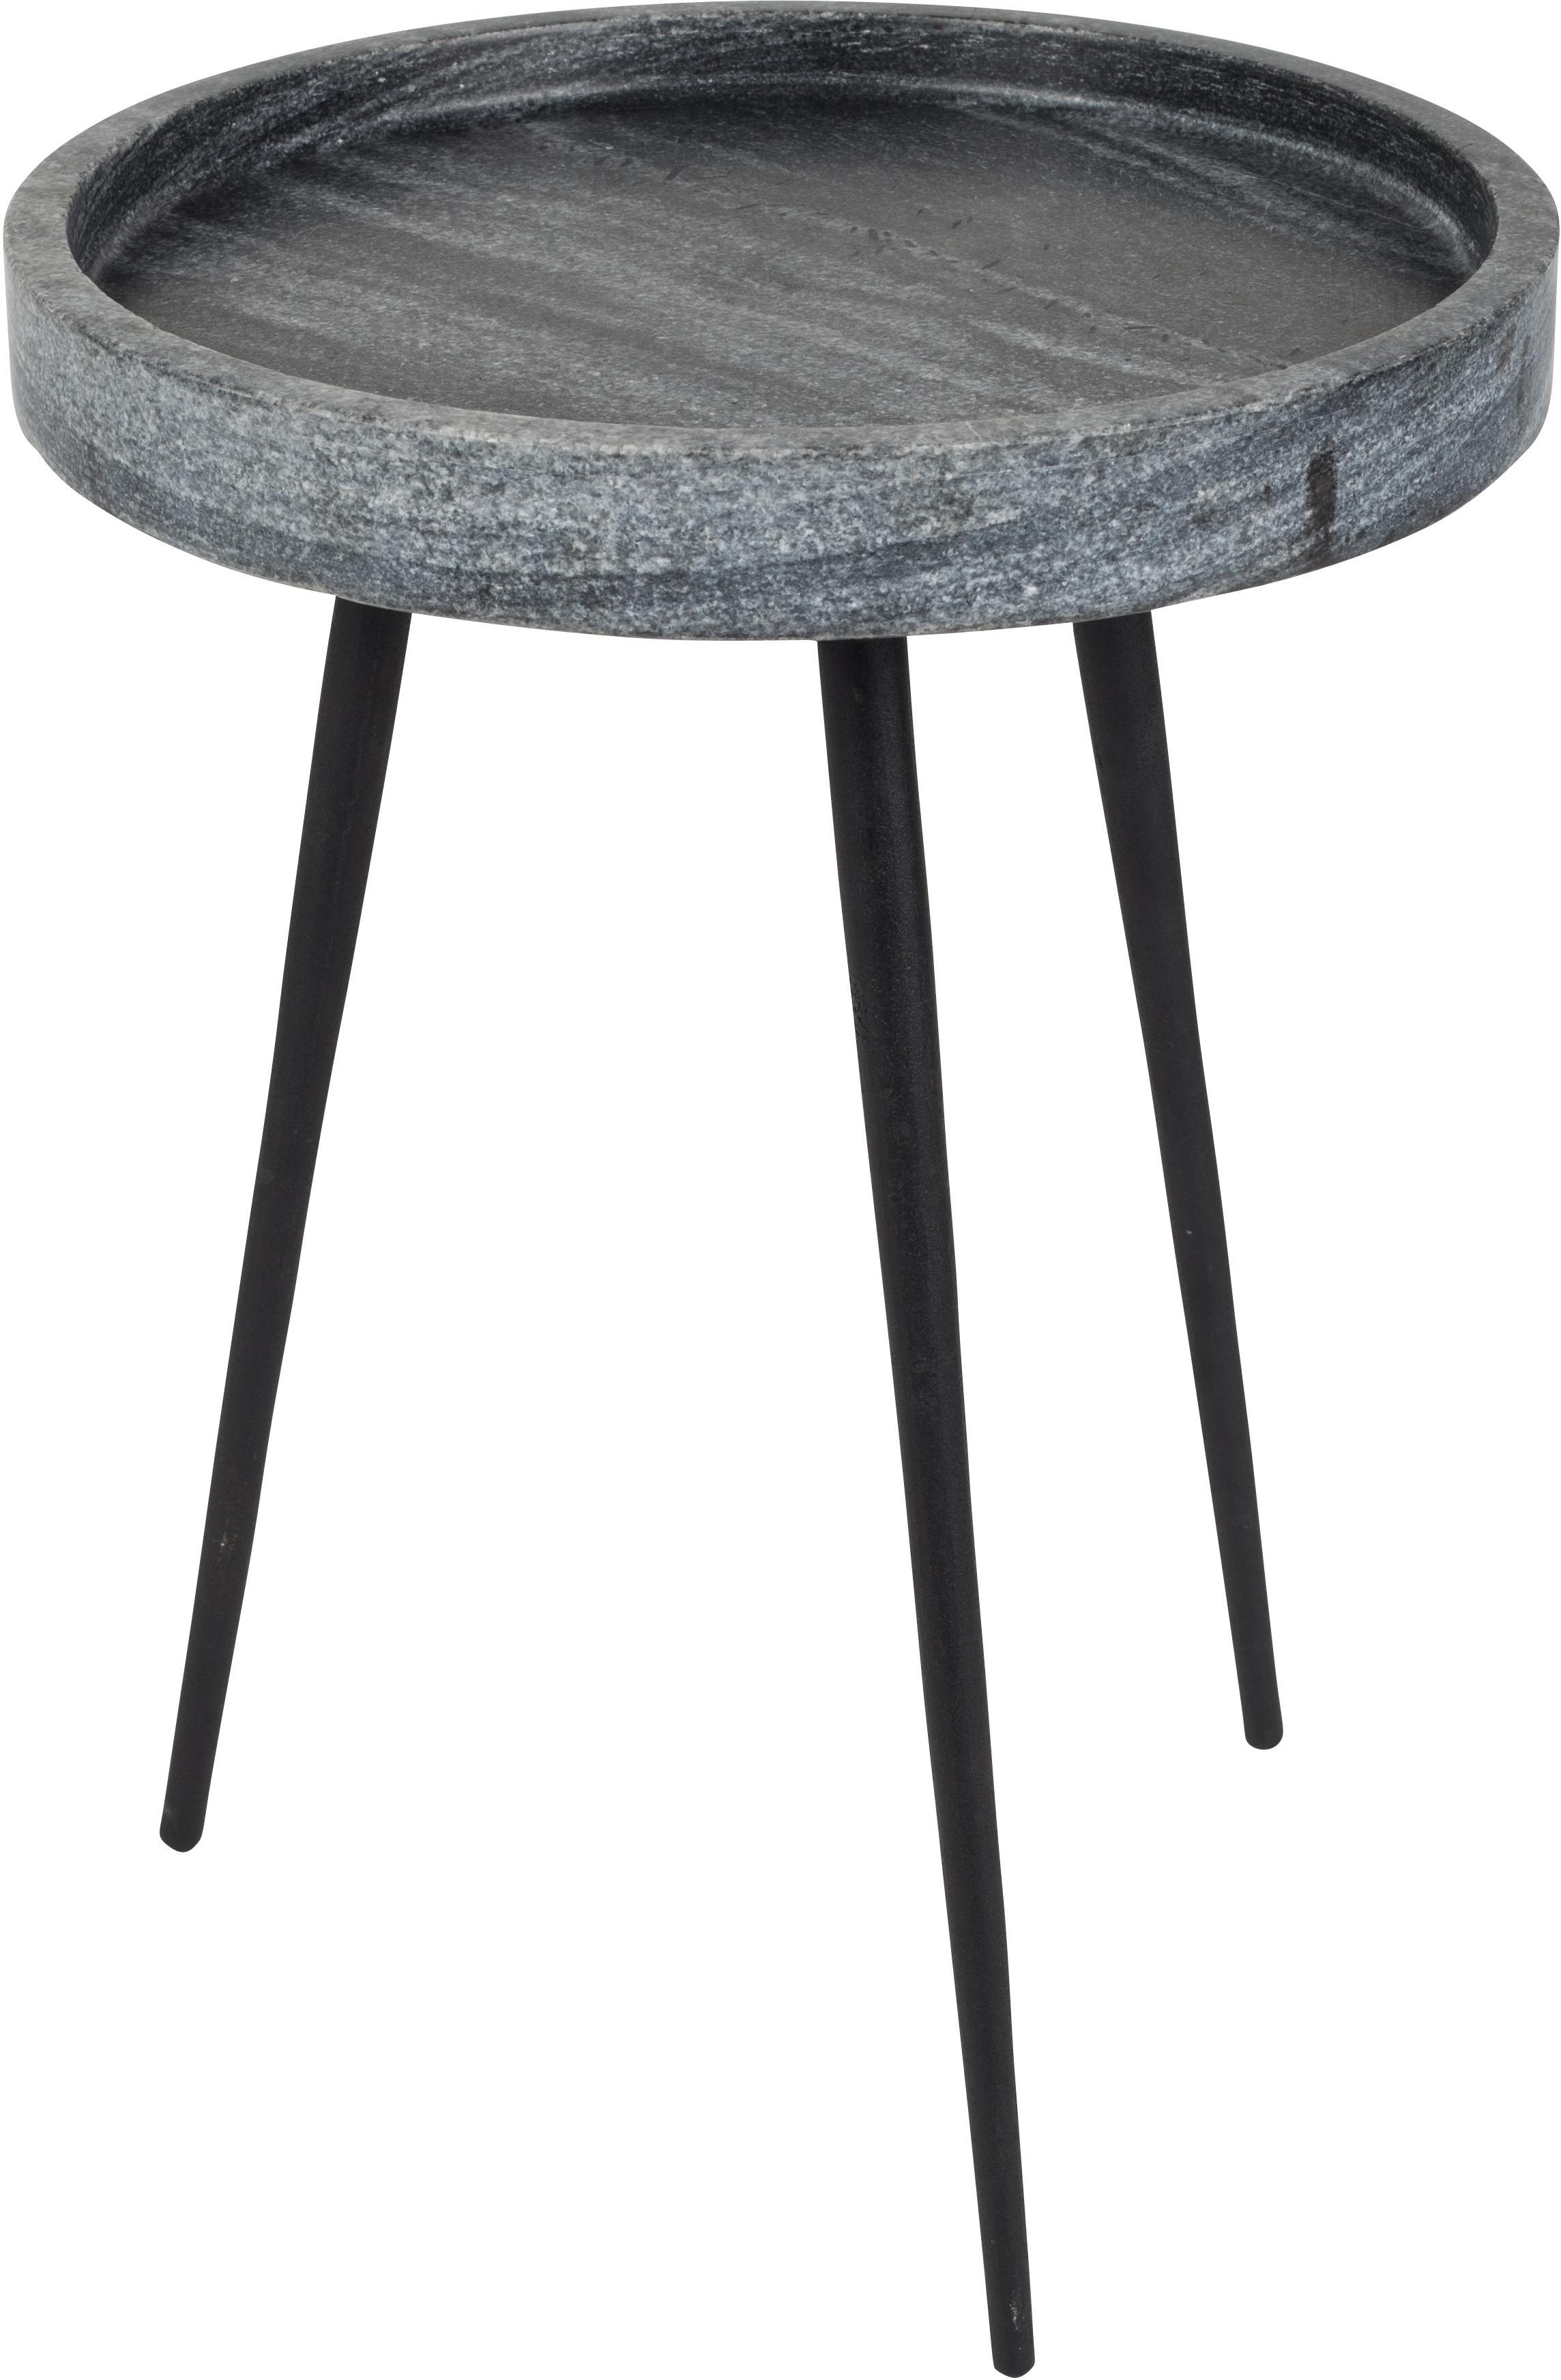 Mesa auxiliar redonda de mármol Karrara, Tablero: mármol, Patas: metal, pintura en polvo, Tablero: gris, veteado Patas: negro, Ø 33 x Al 45 cm